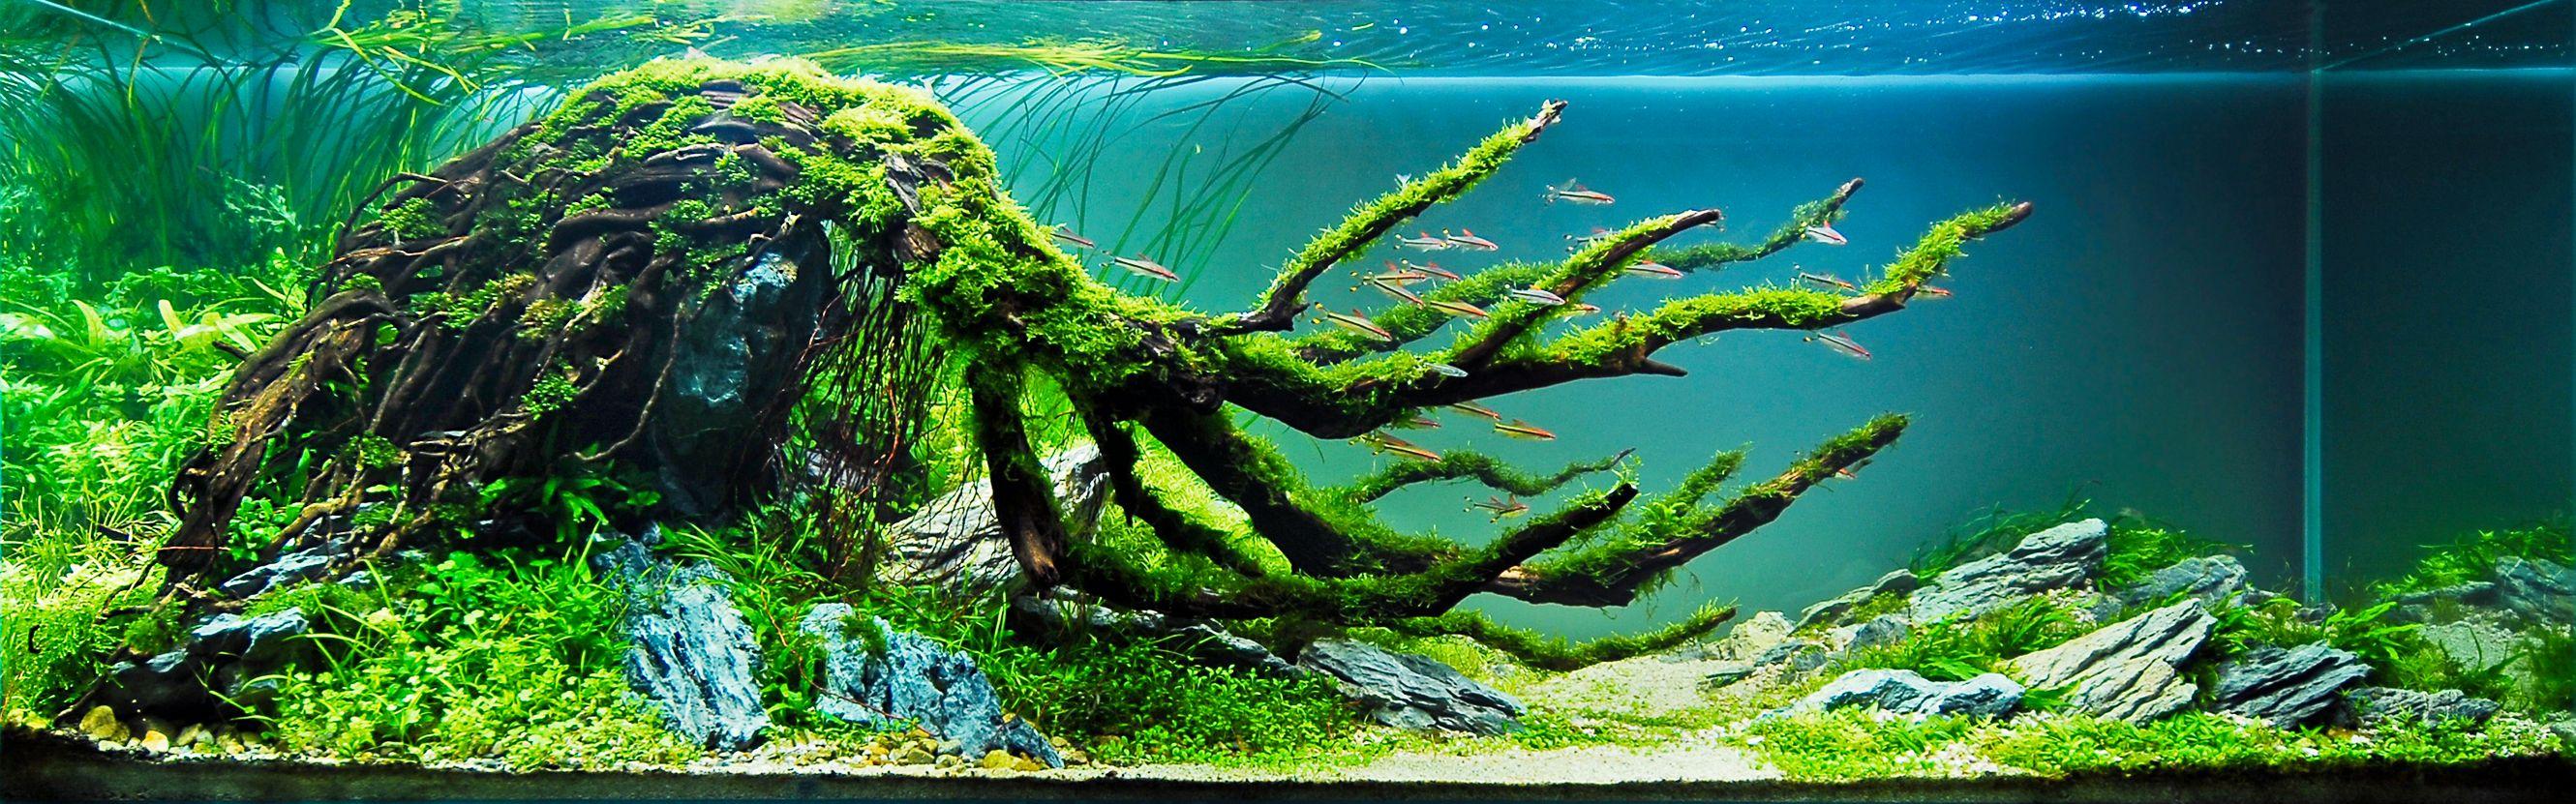 Aquascaping | International Aquatic Plants Layout Contest | Chow Wai Sun